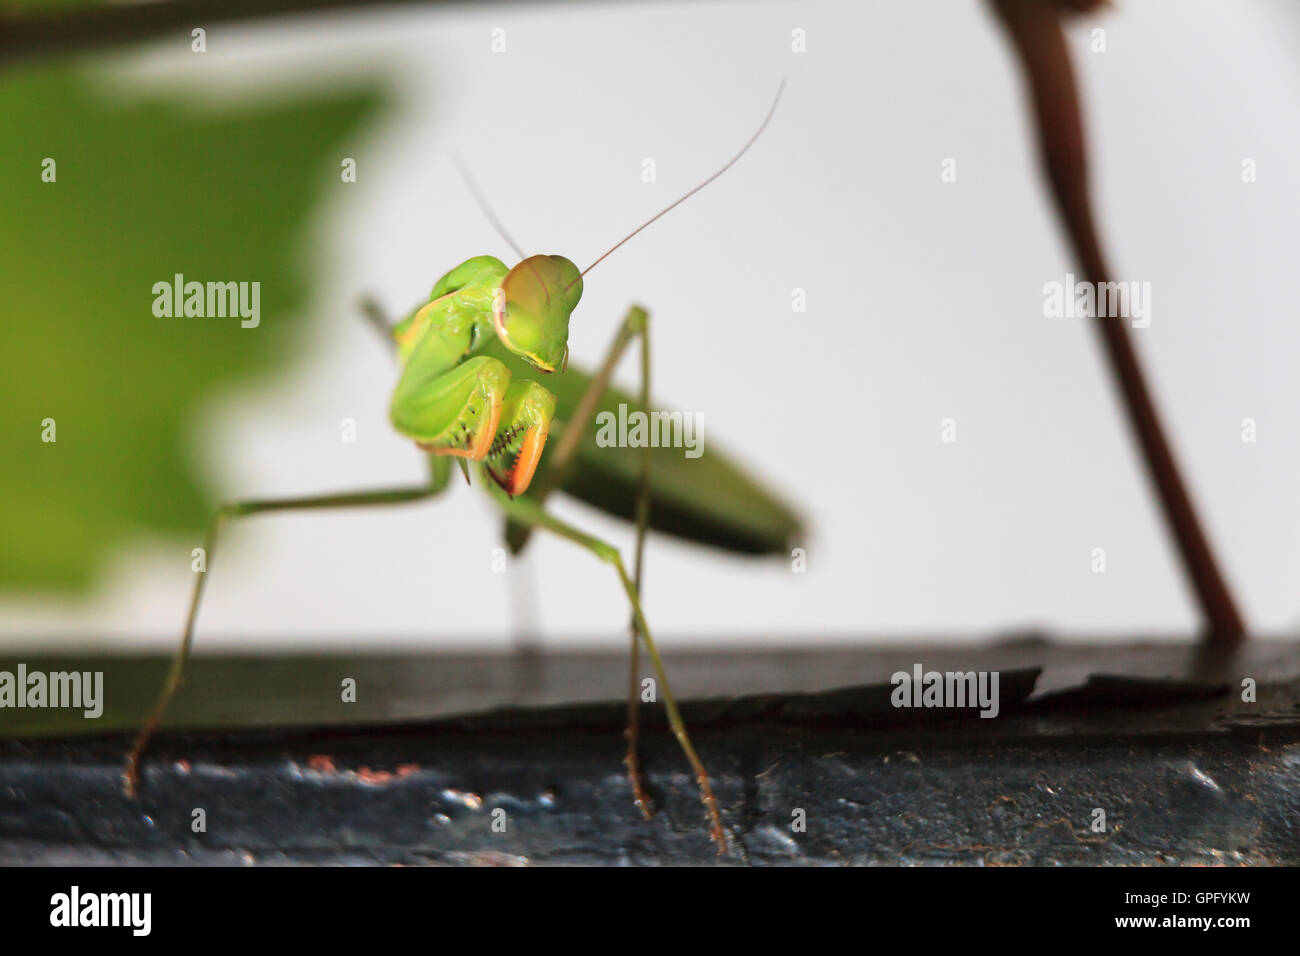 La mante religieuse Mantis religiosa close up Photo Stock